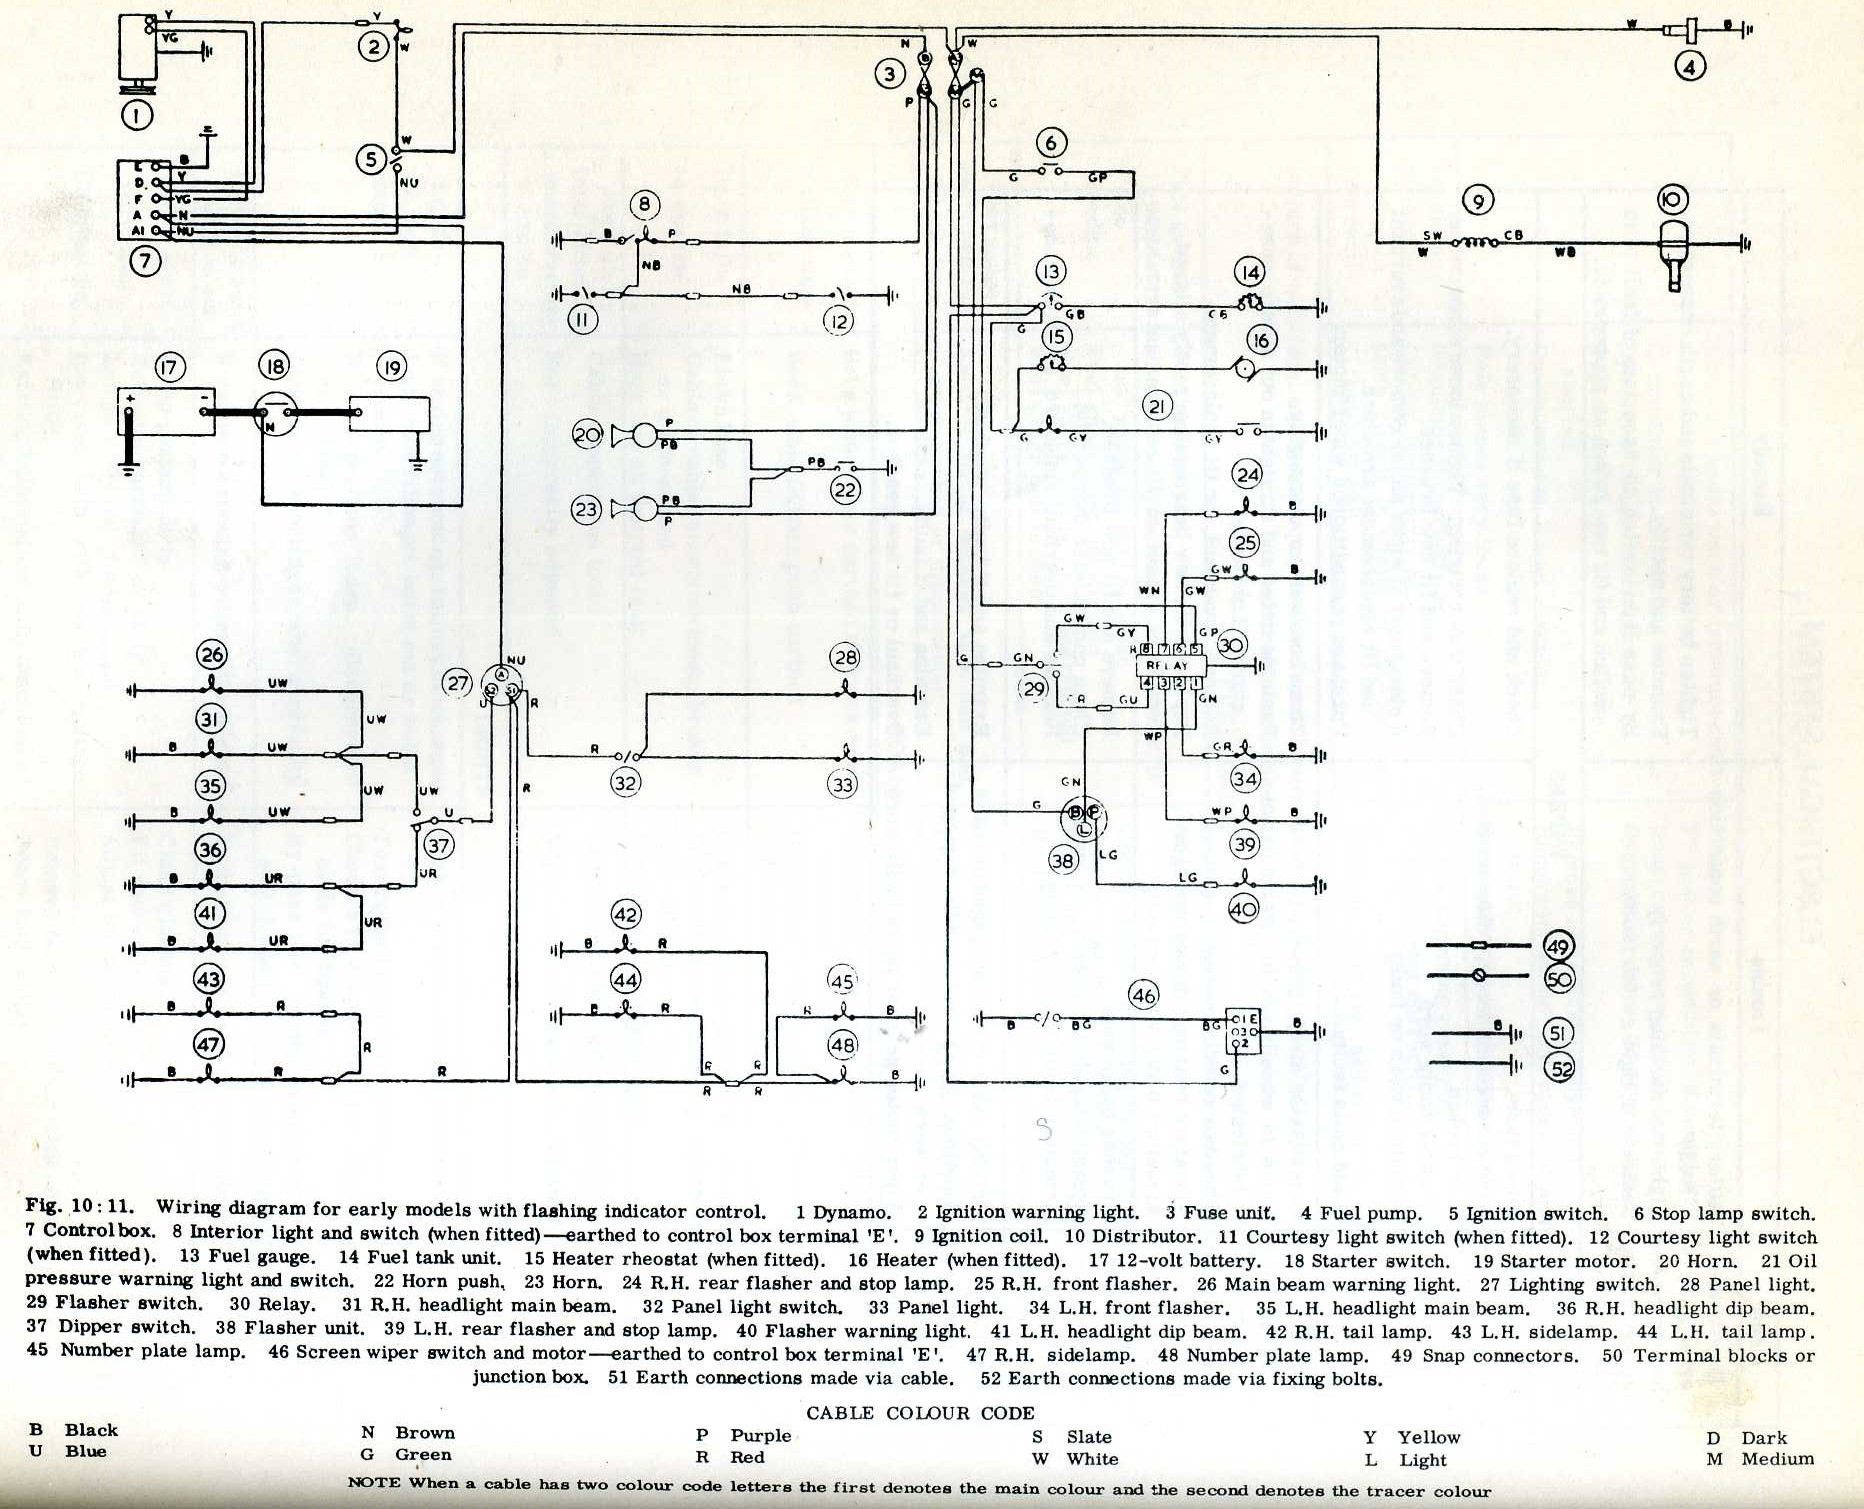 Fantastic Class A Wiring Diagram 1981 Bluebird Model - Electrical ...